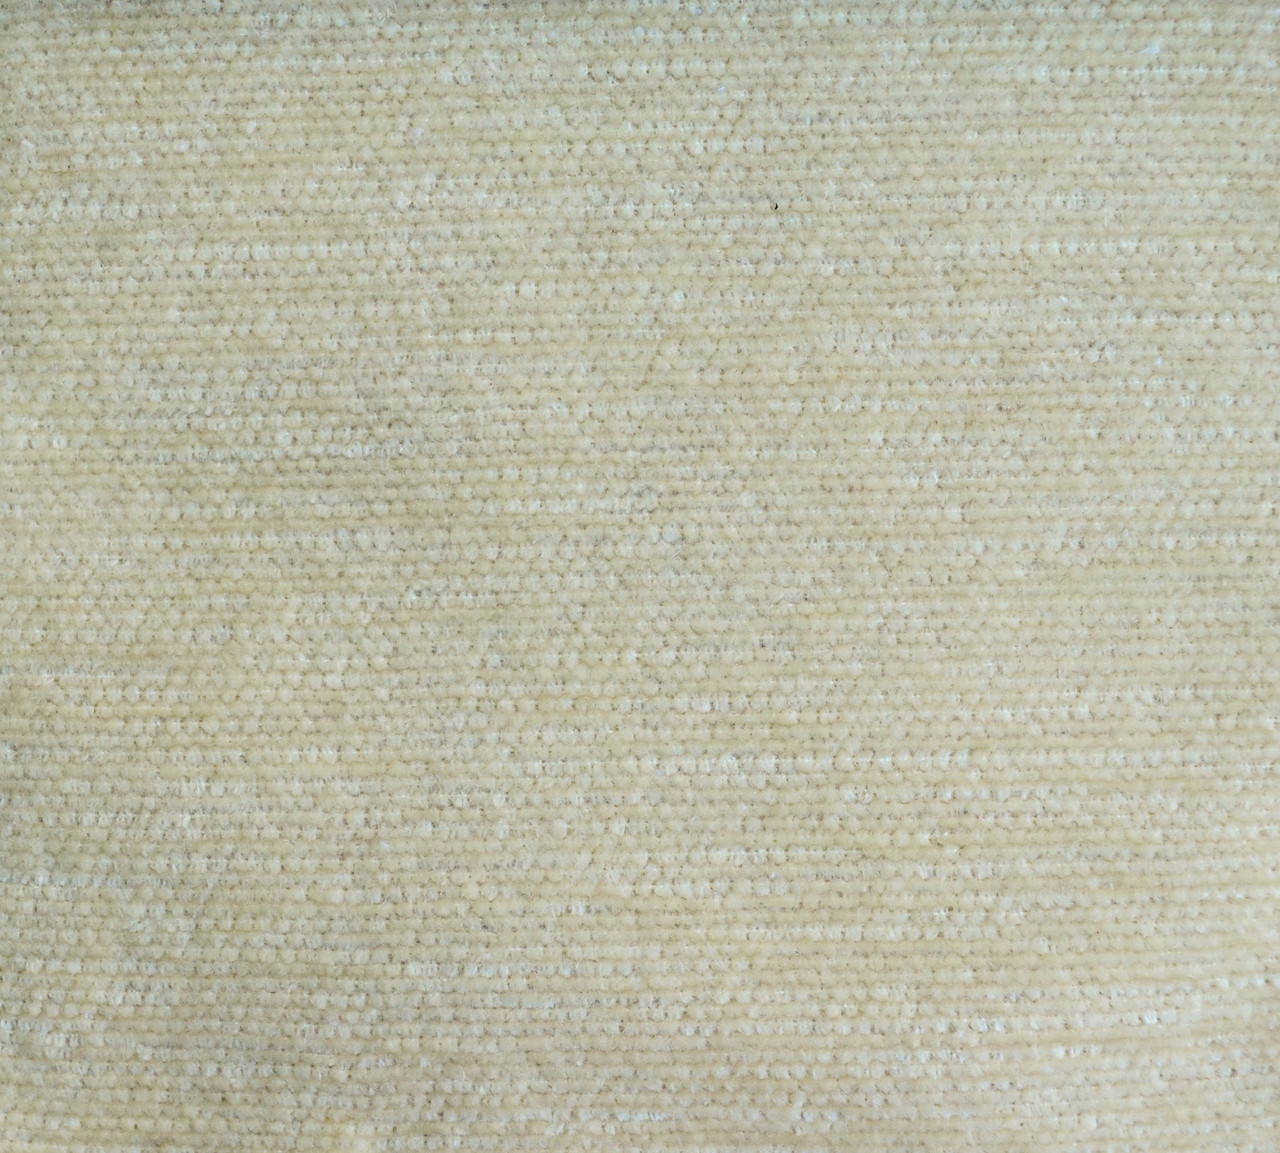 Мебельная ткань Acril 60% Бянколини 99